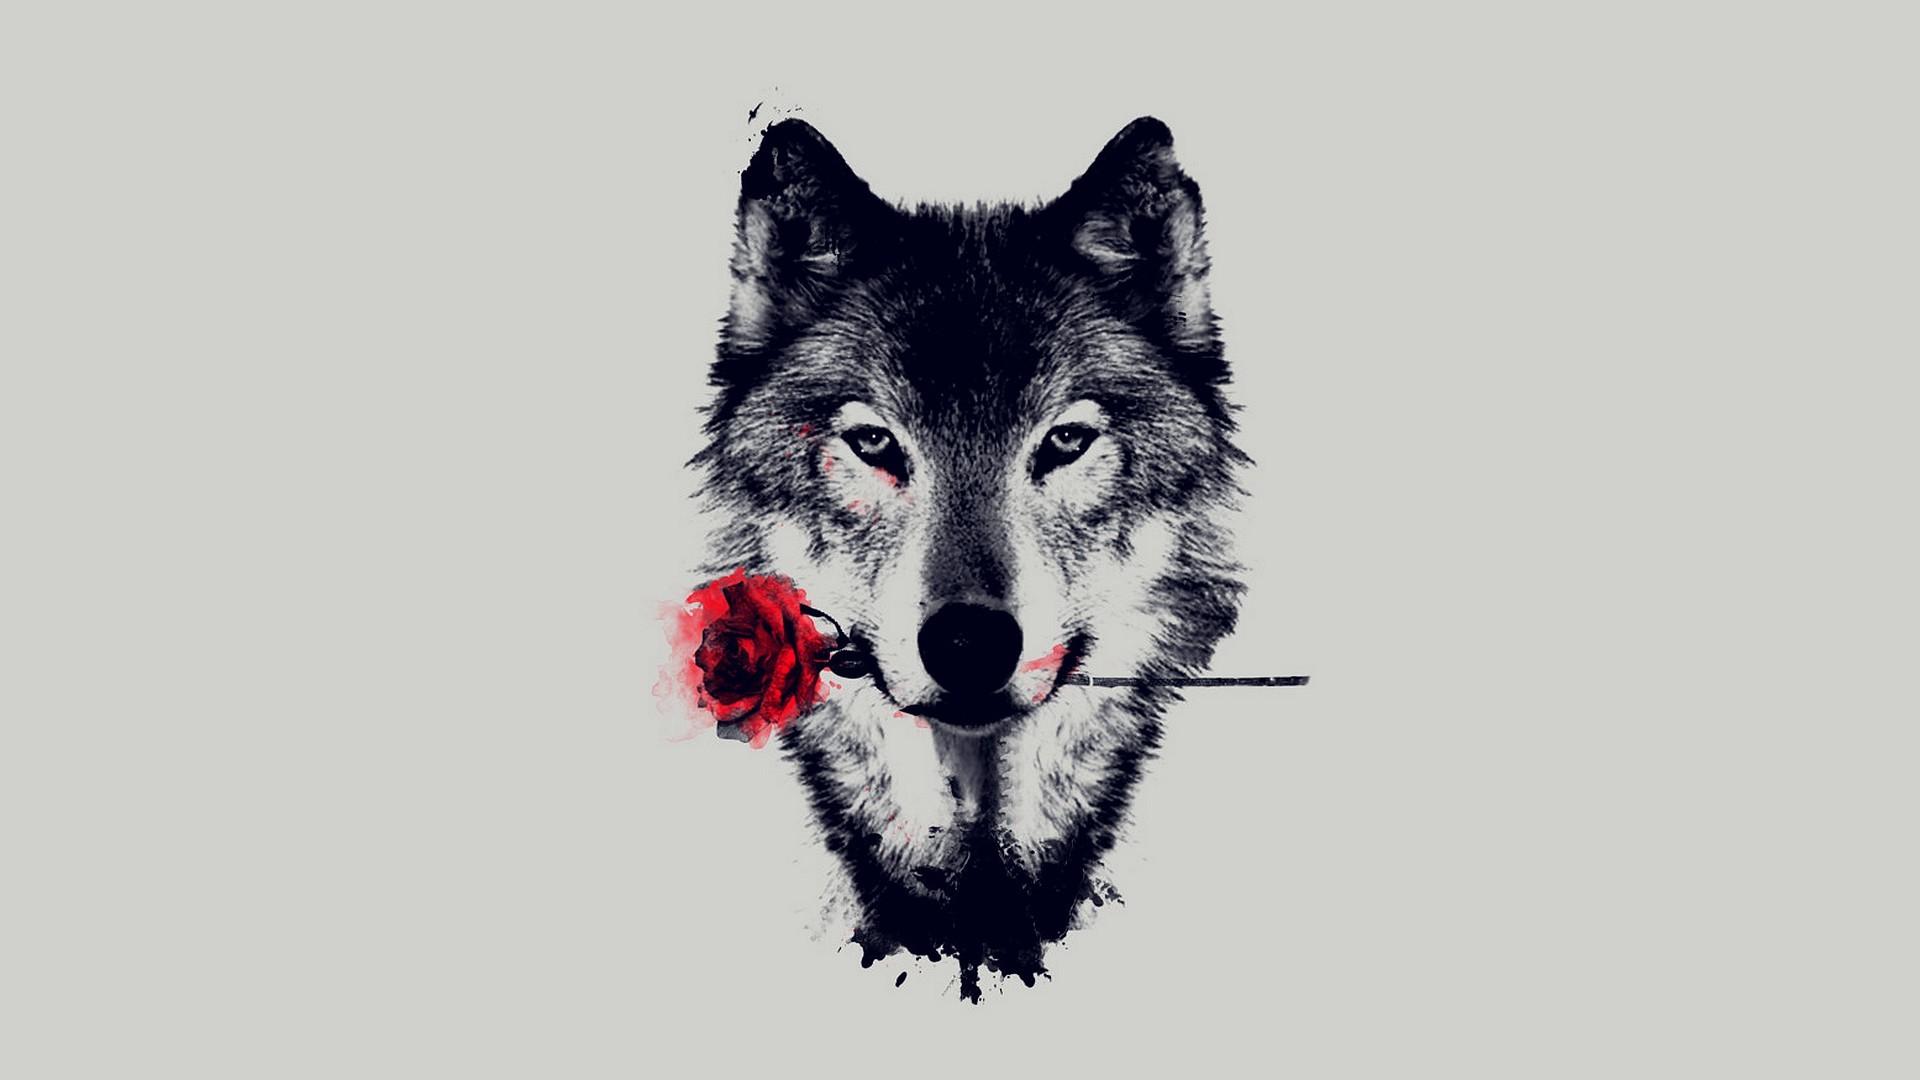 Wolf Art Wallpaper 79 images